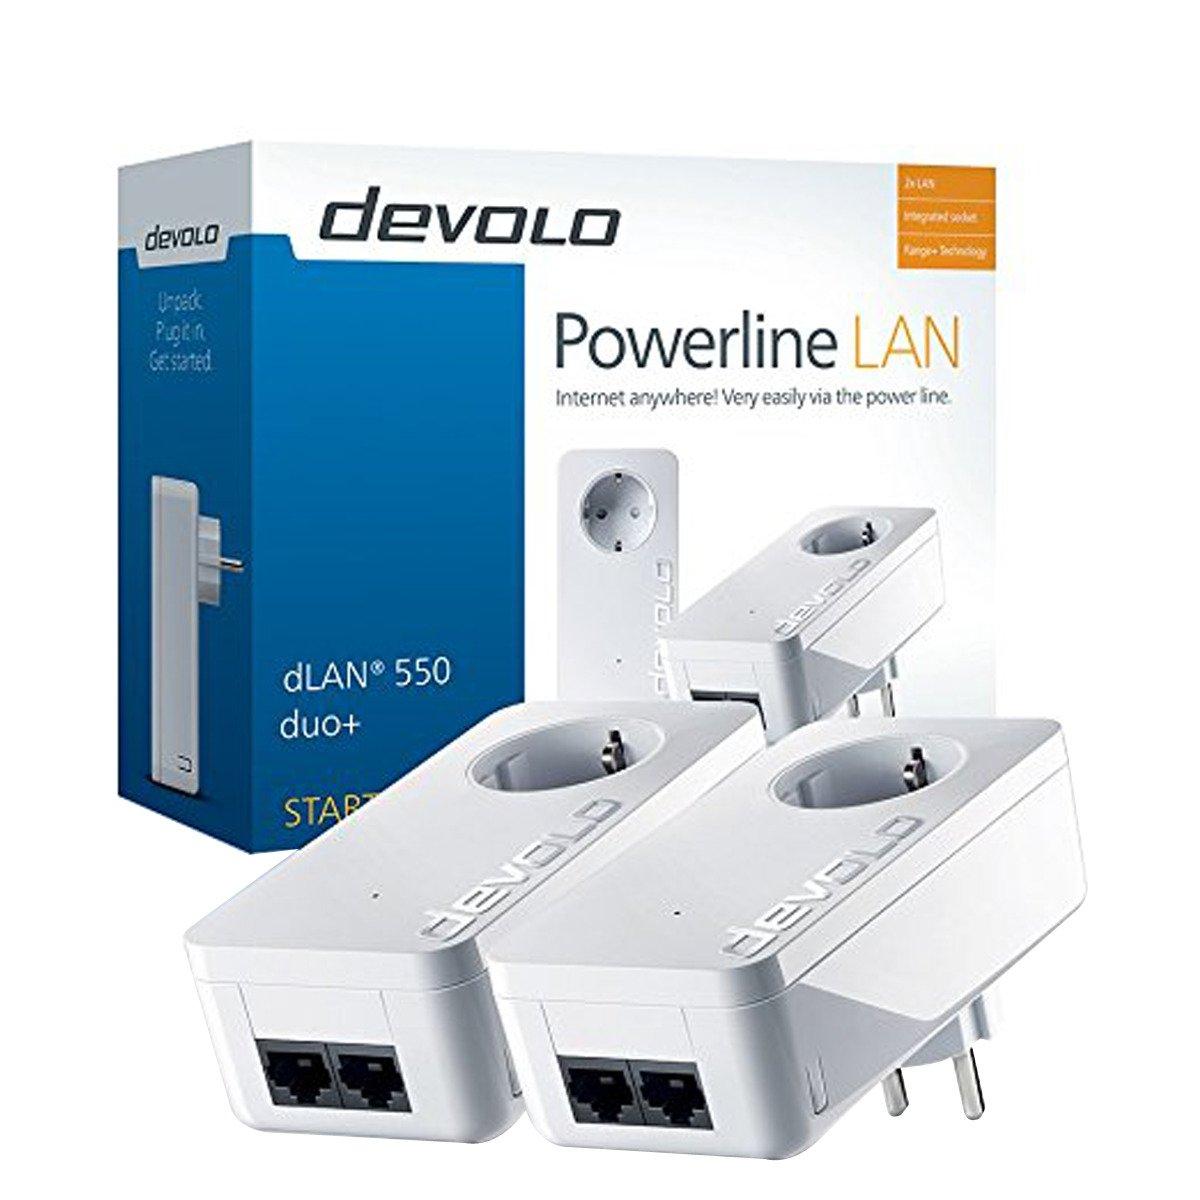 Kit de 2 adaptadores PLC Devolo dLAN 550 duo+ Starter Kit